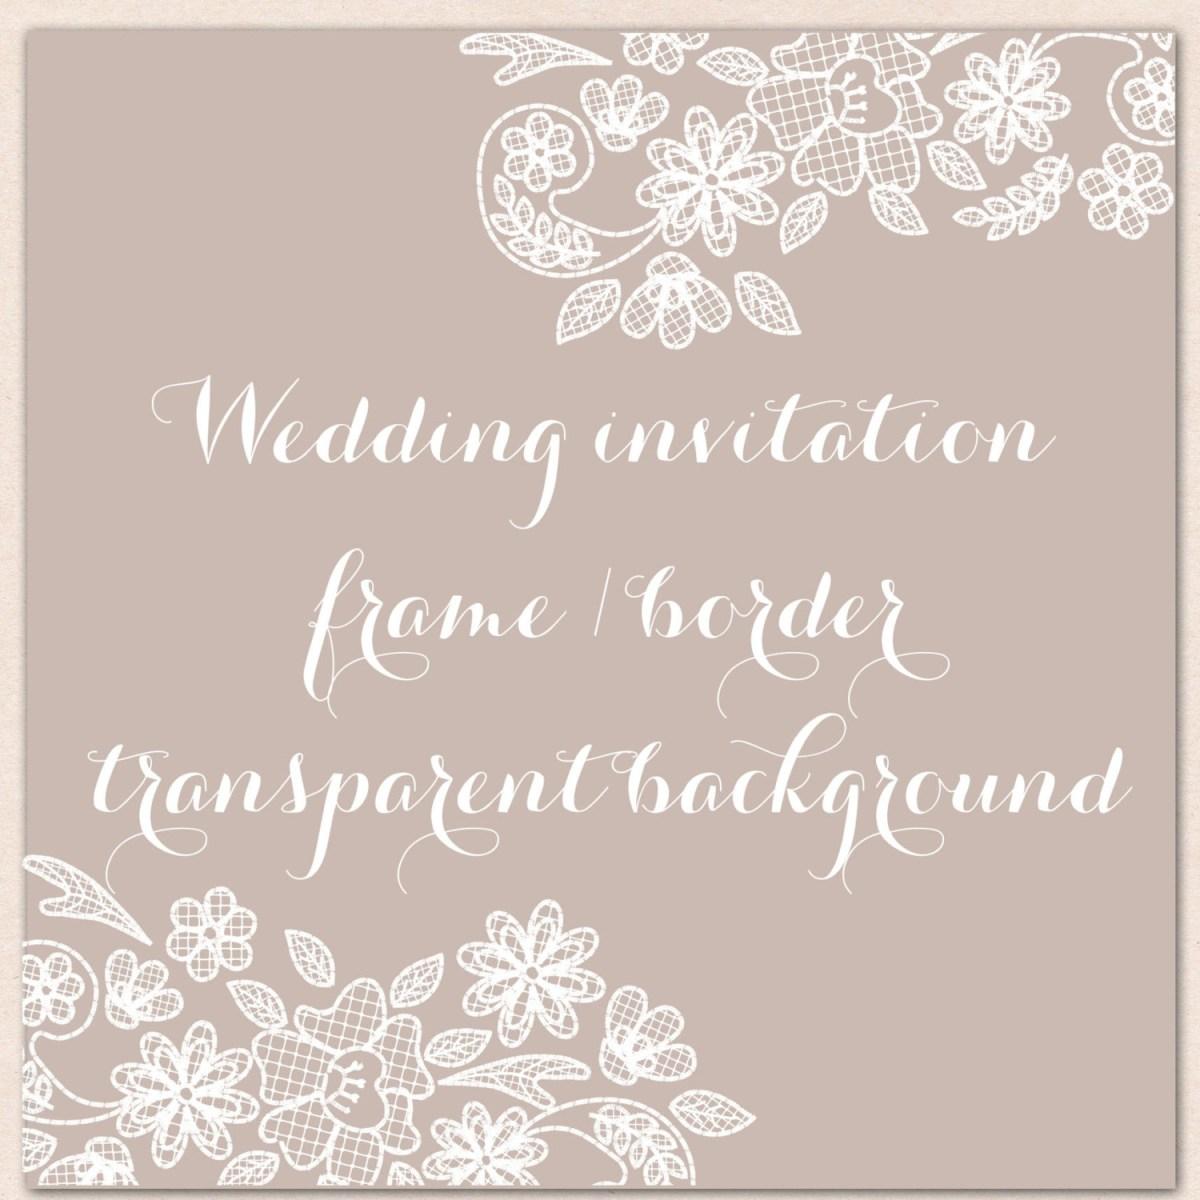 Vintage invitations border . Lace clipart wedding invitation lace